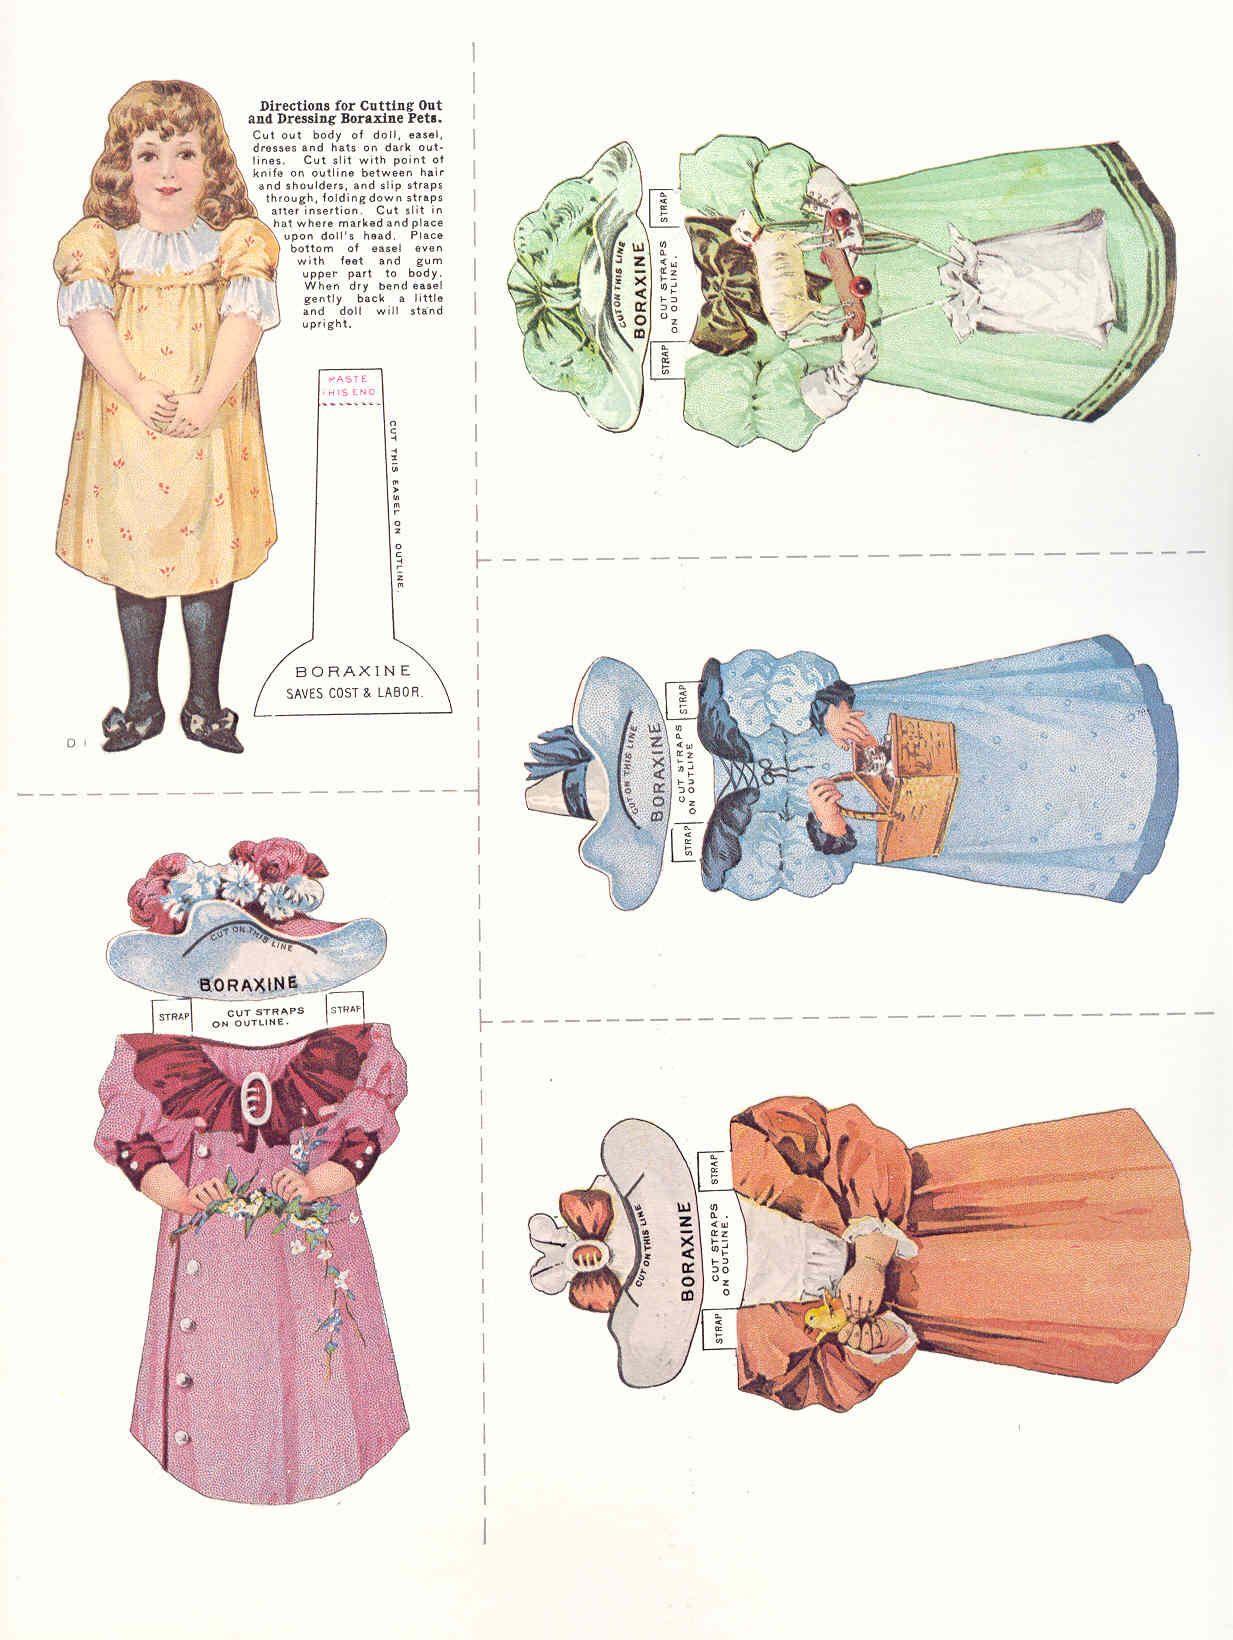 1950 toys images  advertising paper dolls  Bing Images  Arielle Gabriel Antique